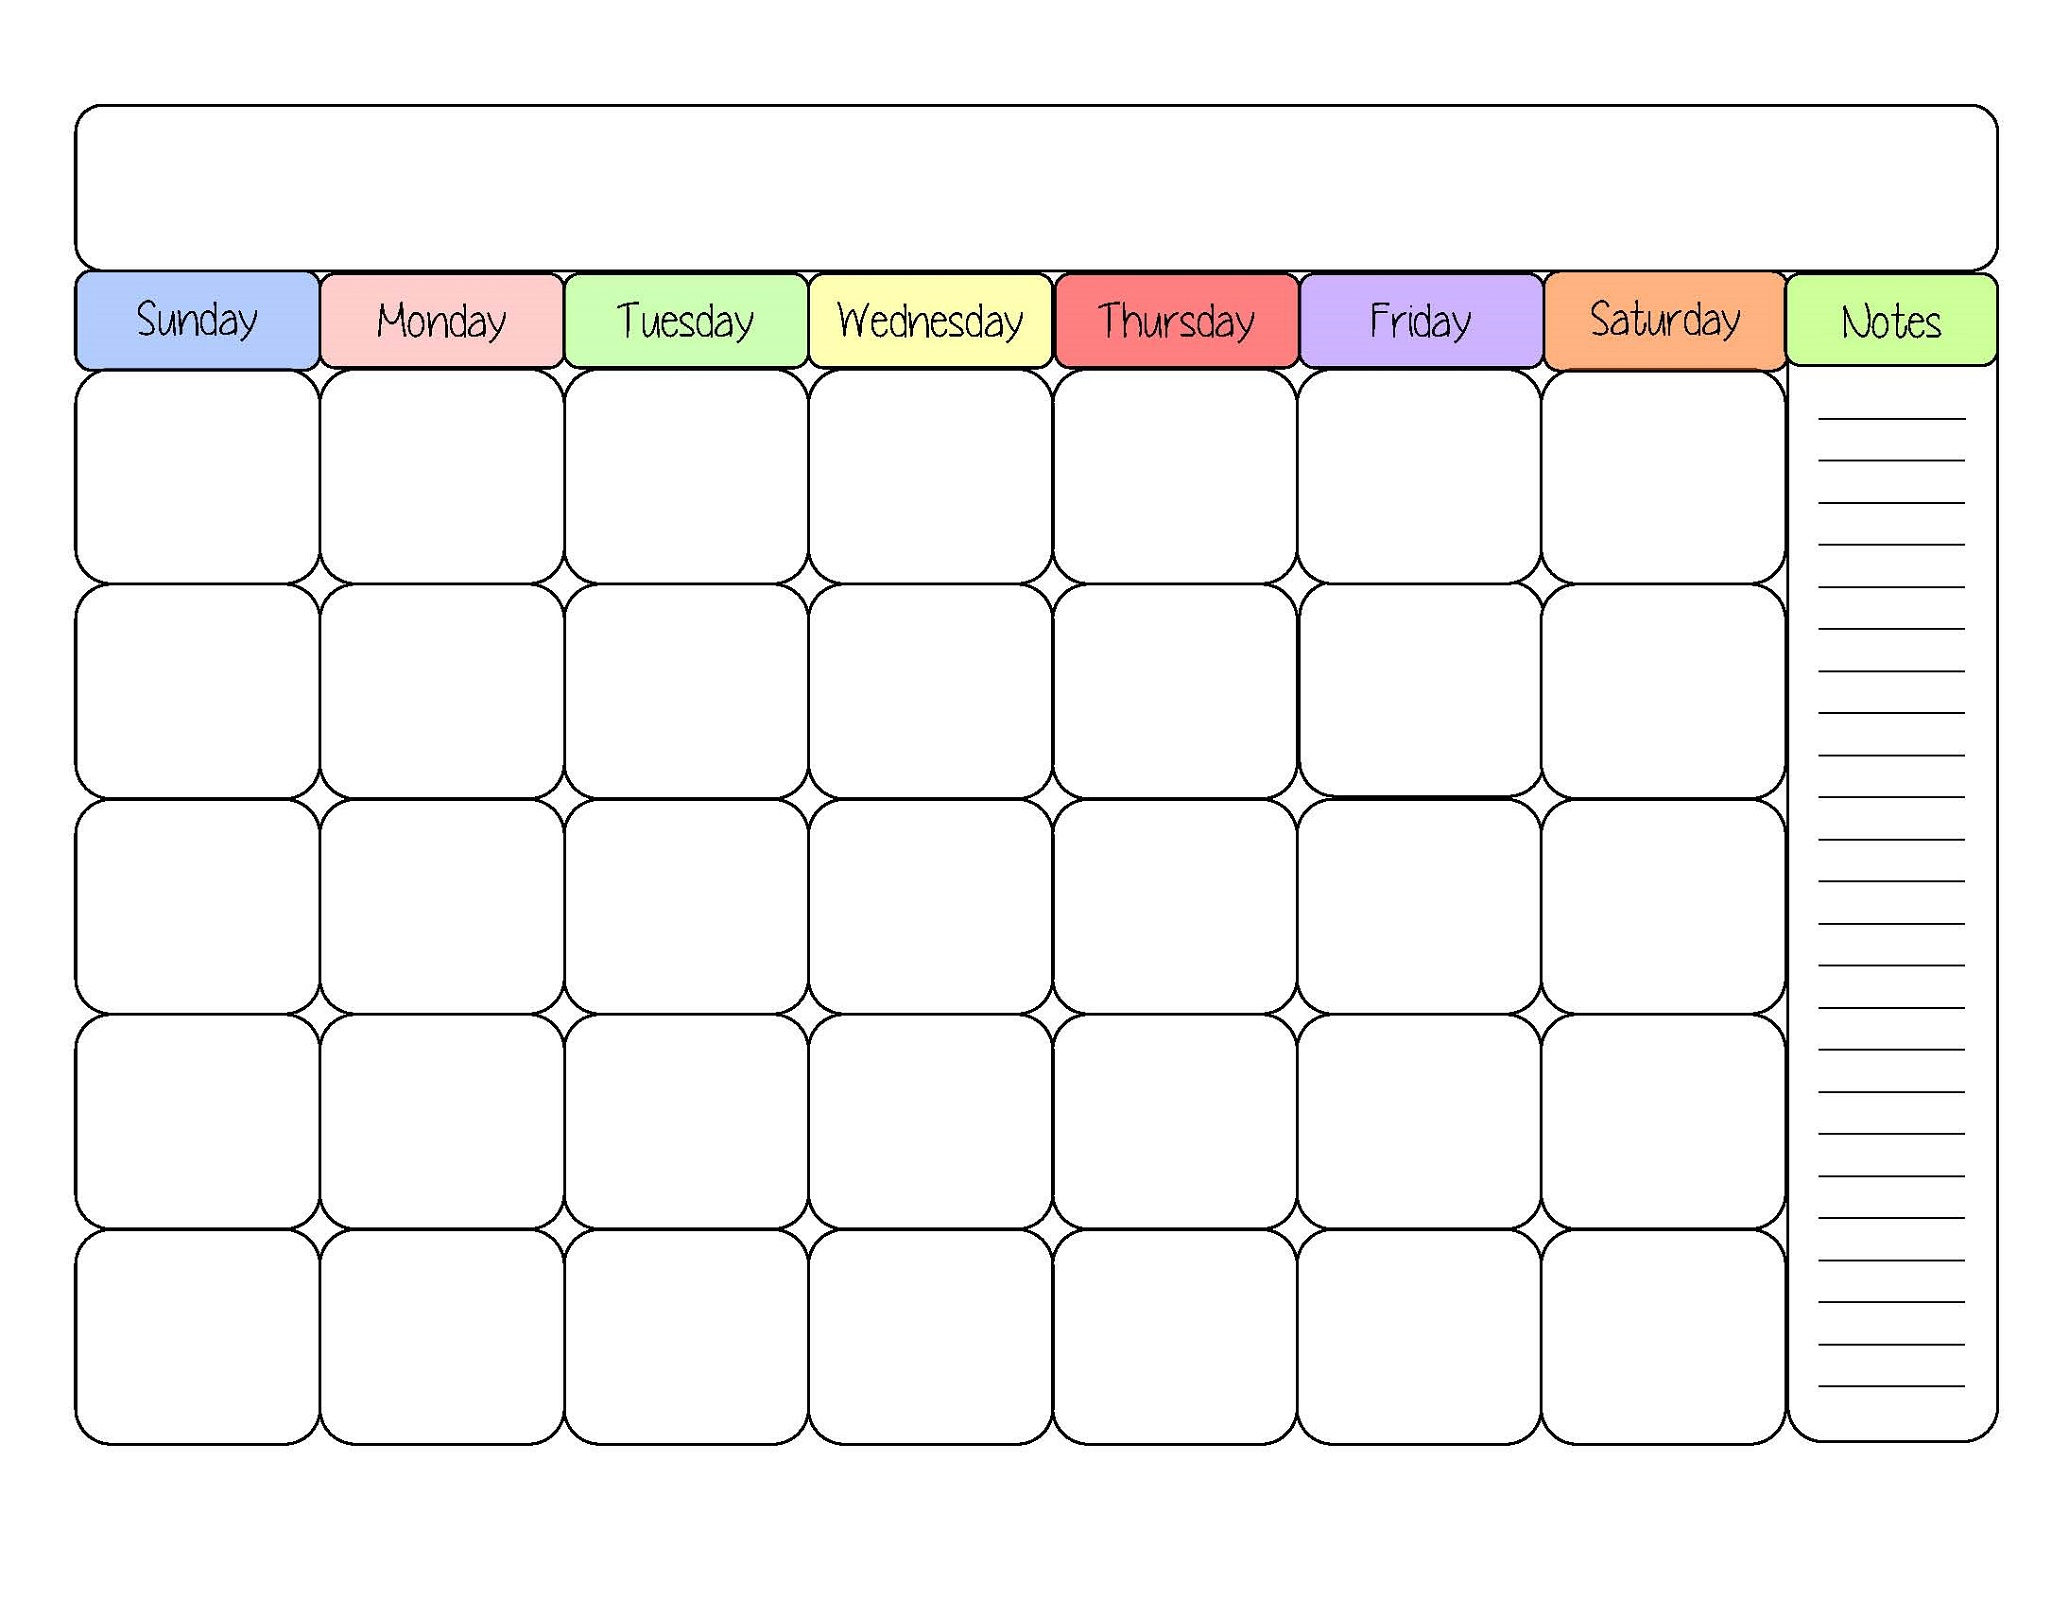 Free Printable Calendar Templates | Activity Shelter inside Free Blank Calendar Sheets